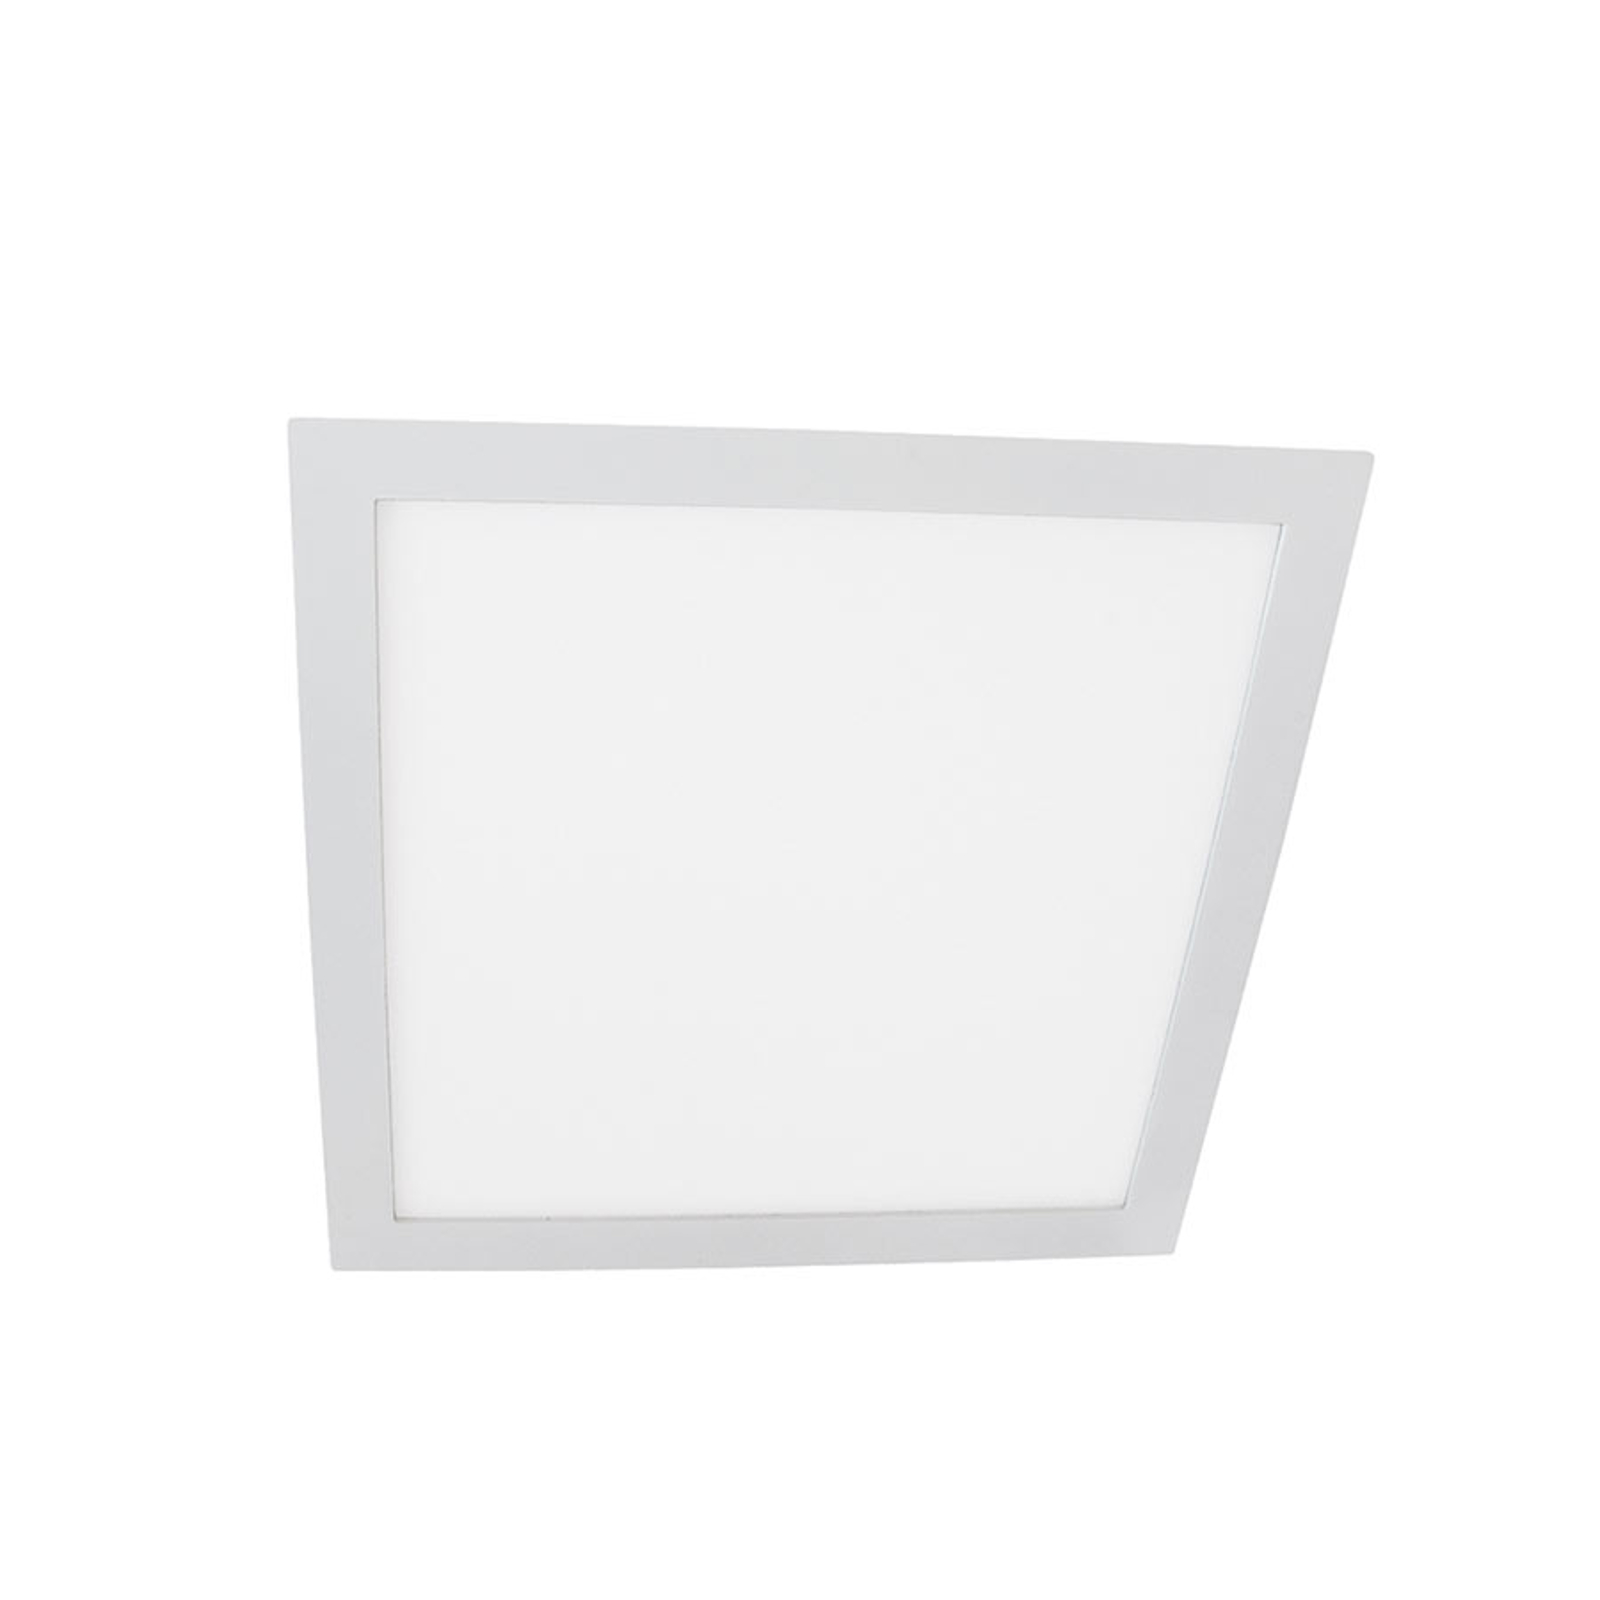 Moon Square LED-downlight 6W, 3 000 K